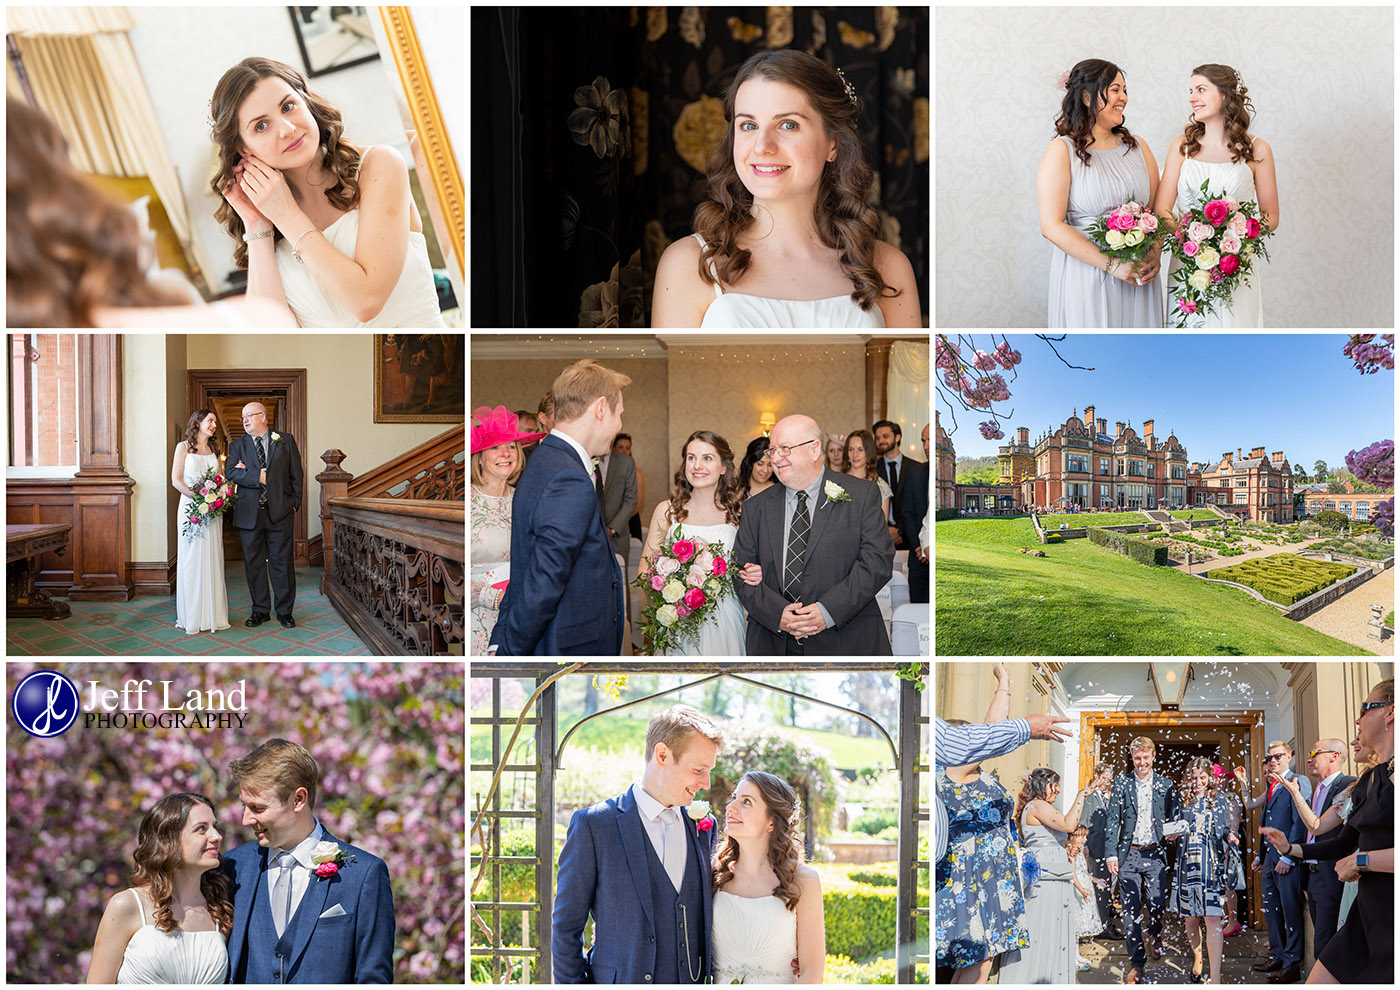 Welcombe Hotel, Stratford upon Avon, wedding photographer, Event photographer